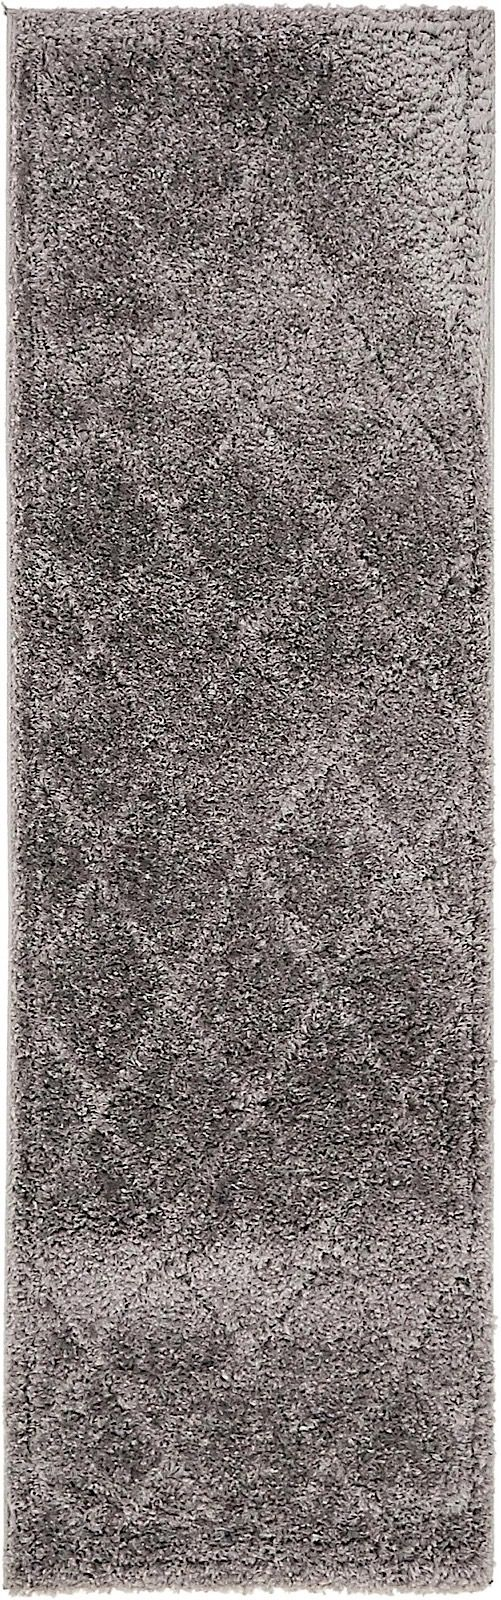 rugpal lattice shag shag area rug collection